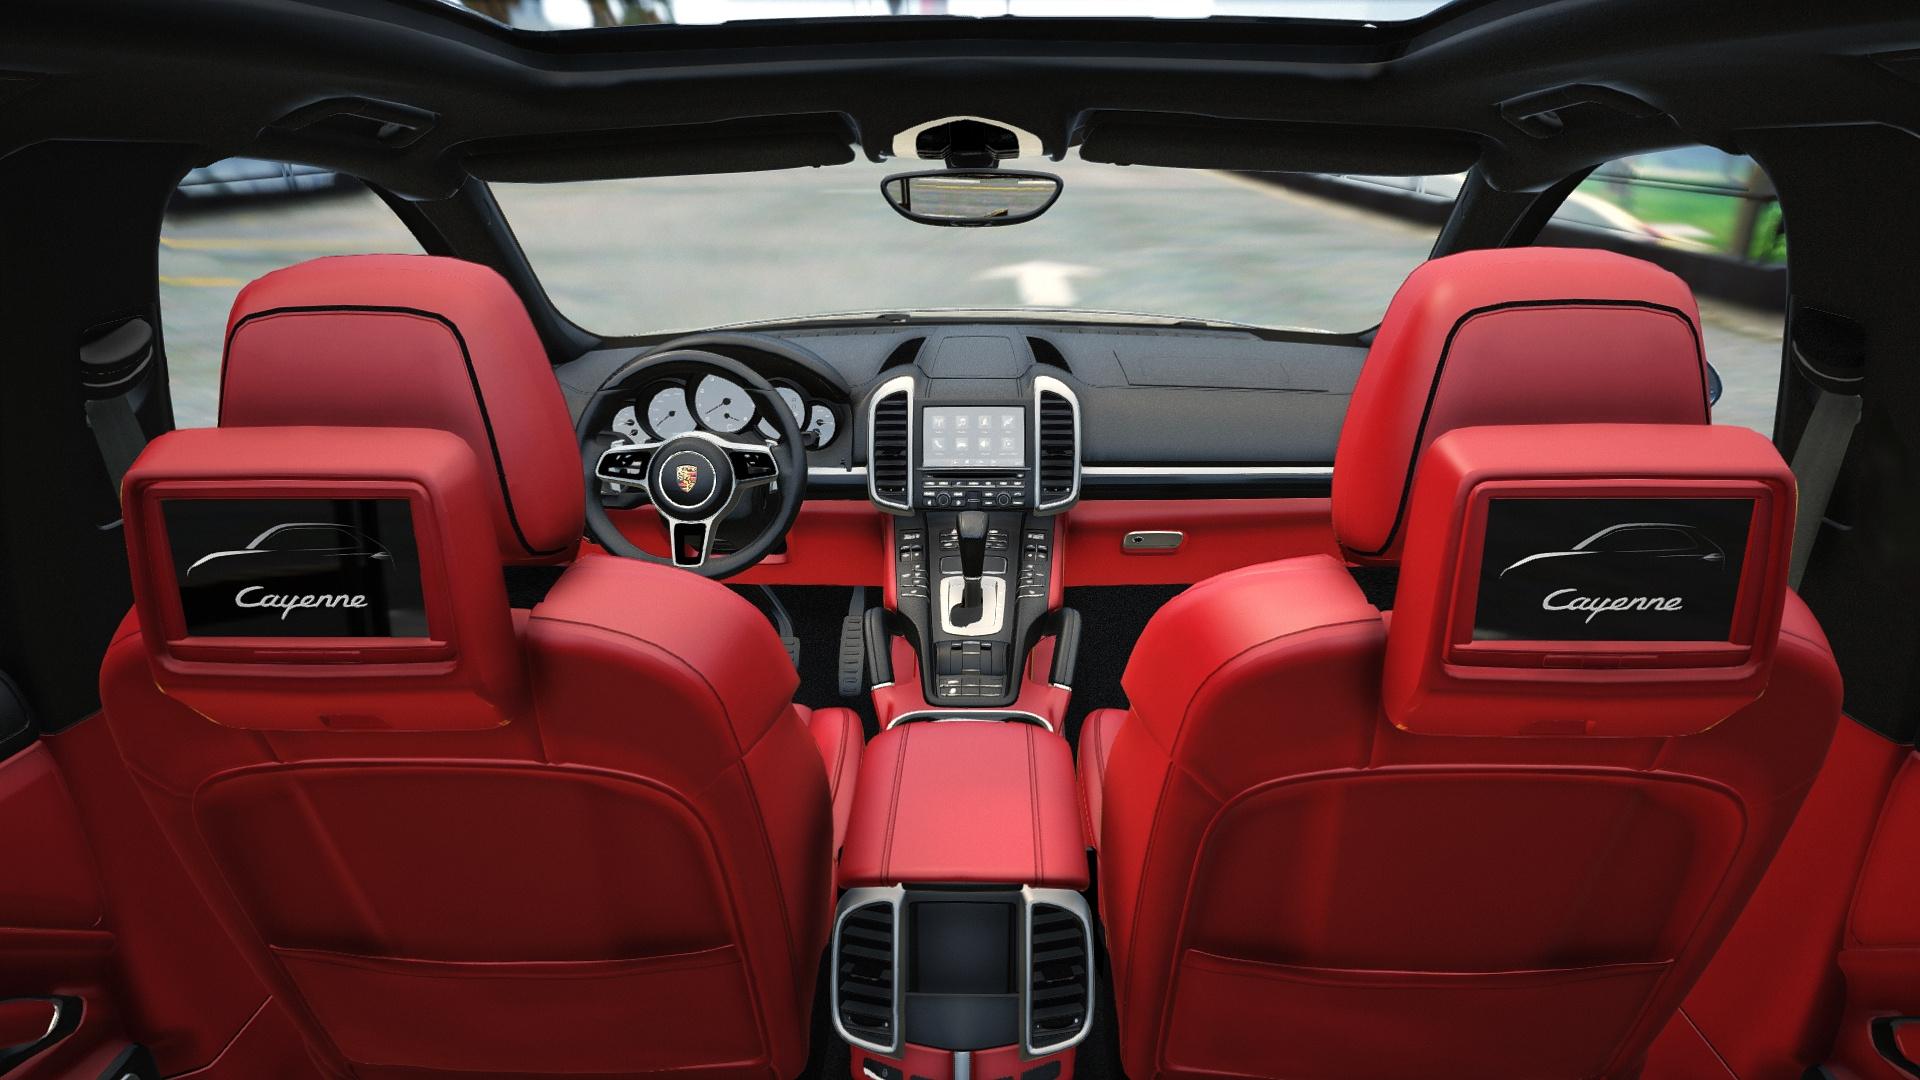 1495b2 gta5 2017 02 04 21 10 12 161 - Porsche Cayenne Turbo